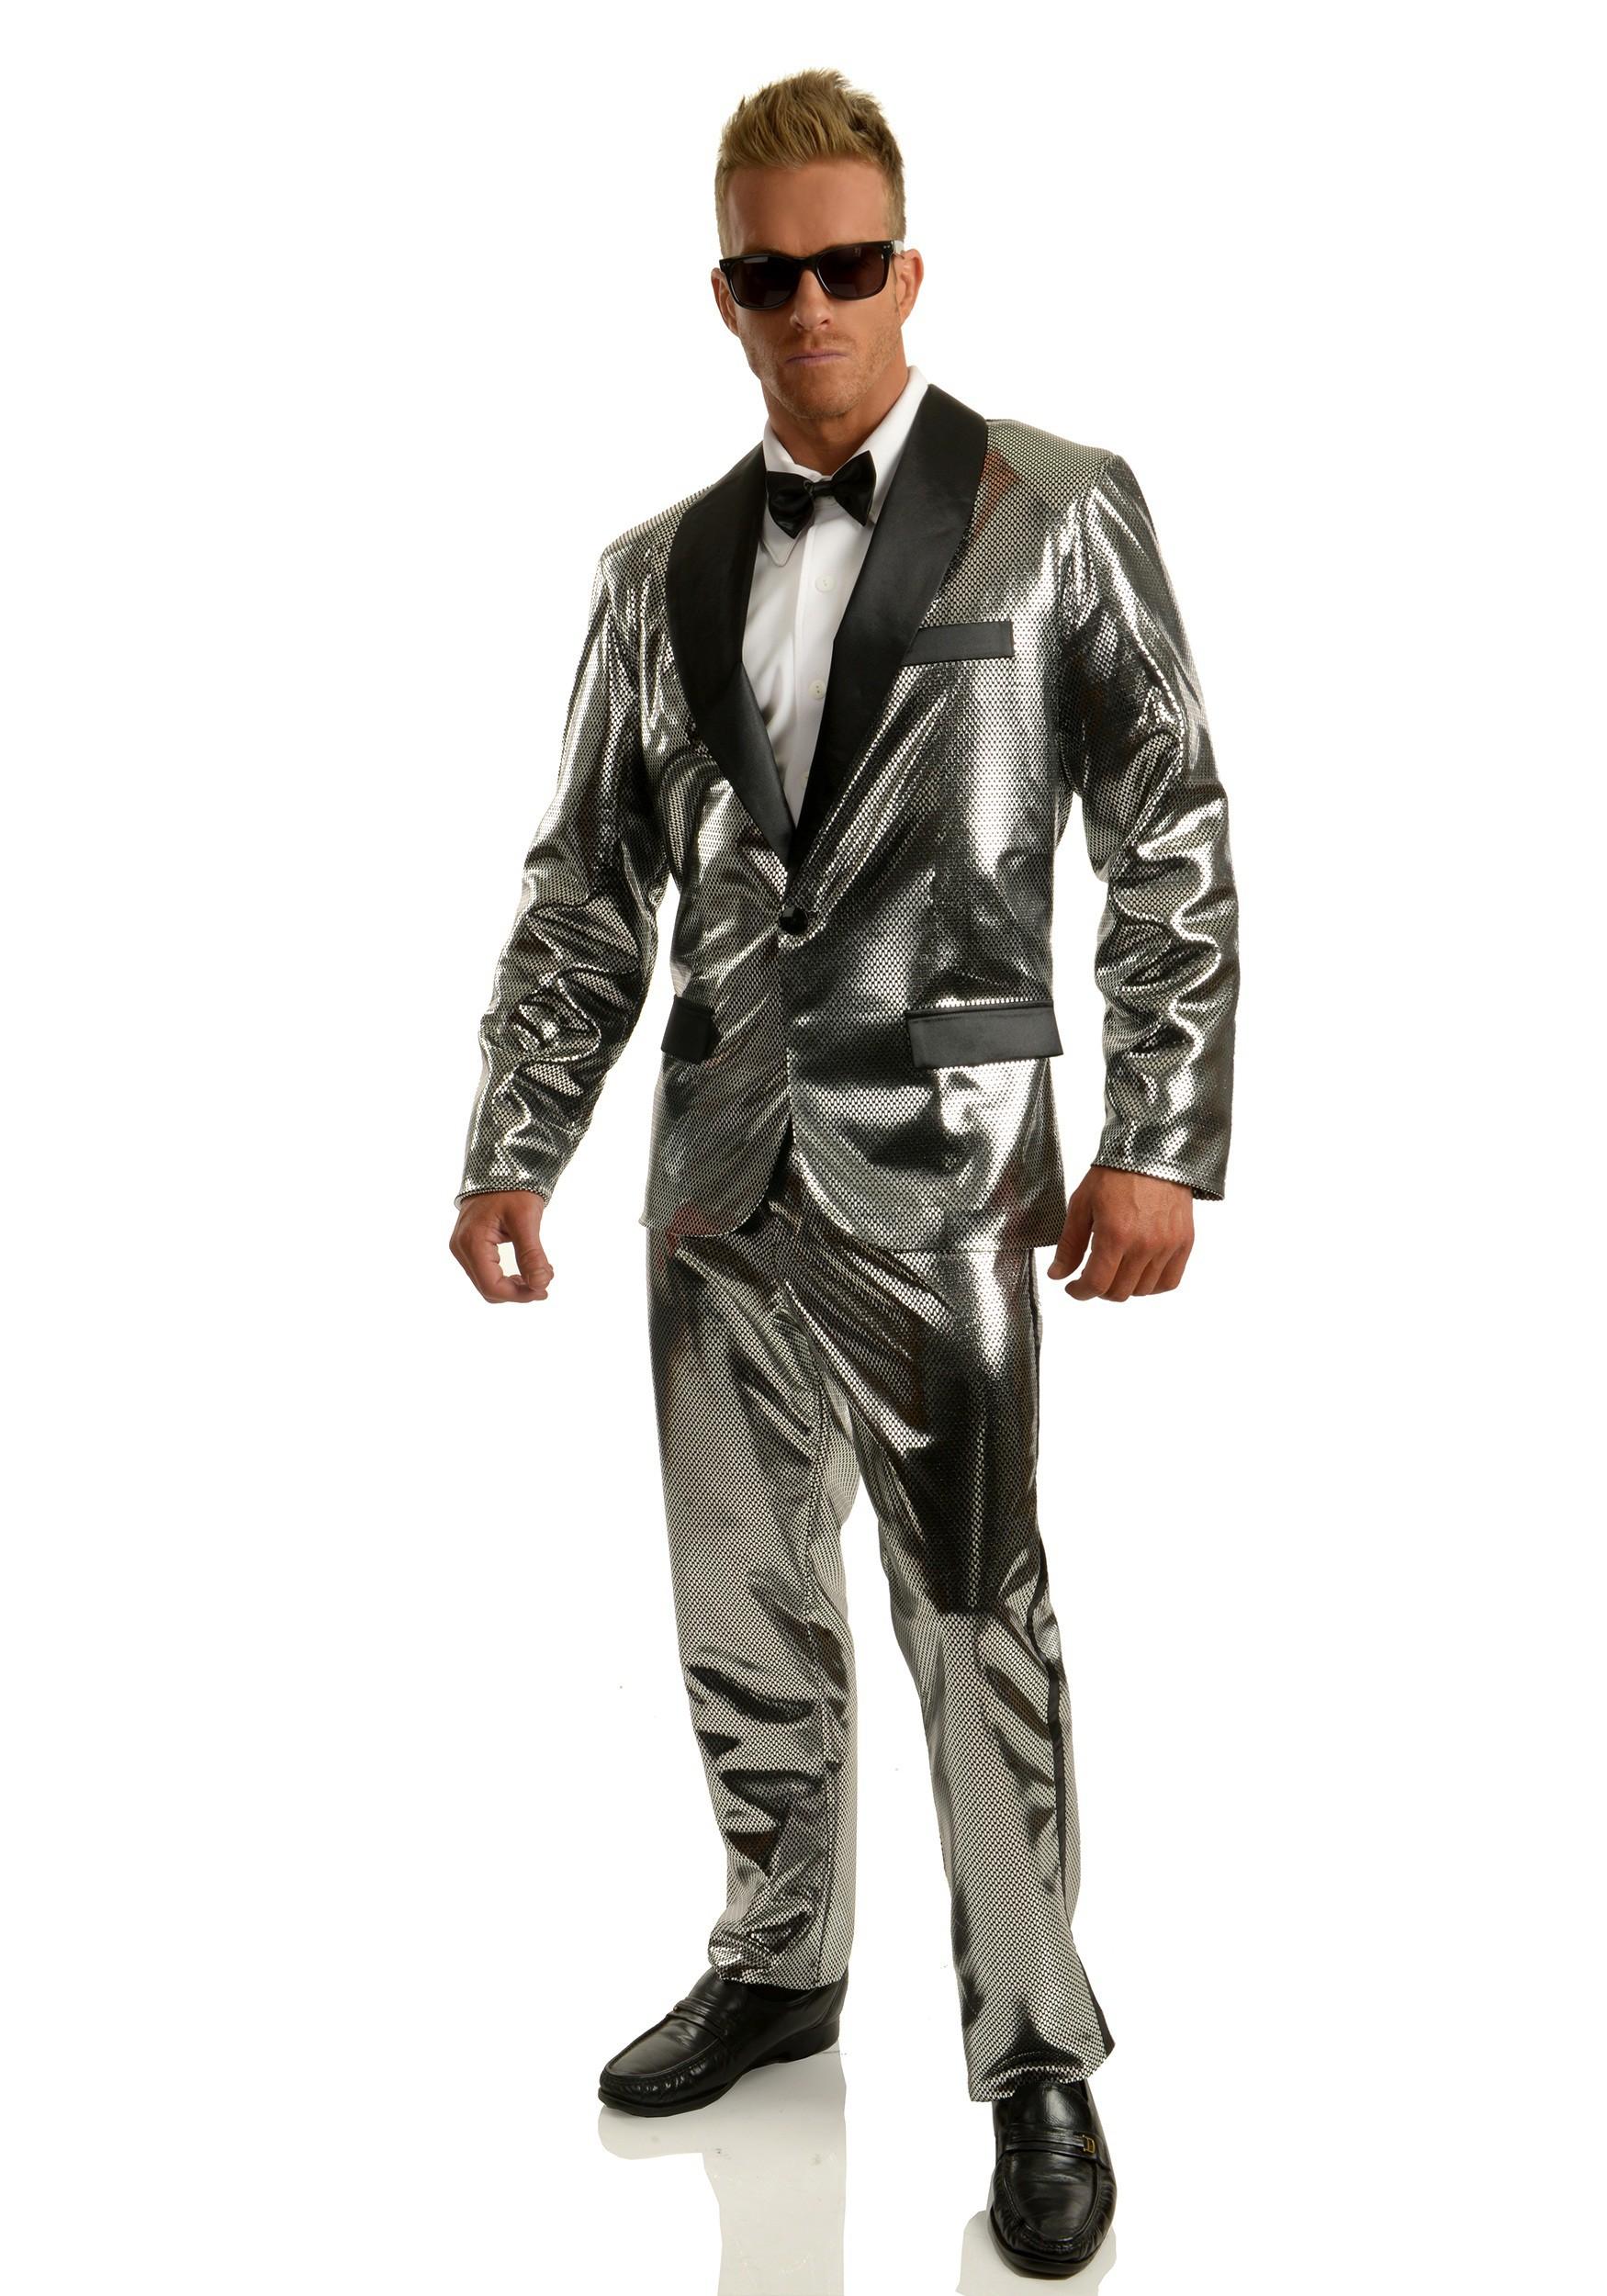 Mens Silver Disco Ball Tuxedo Costume